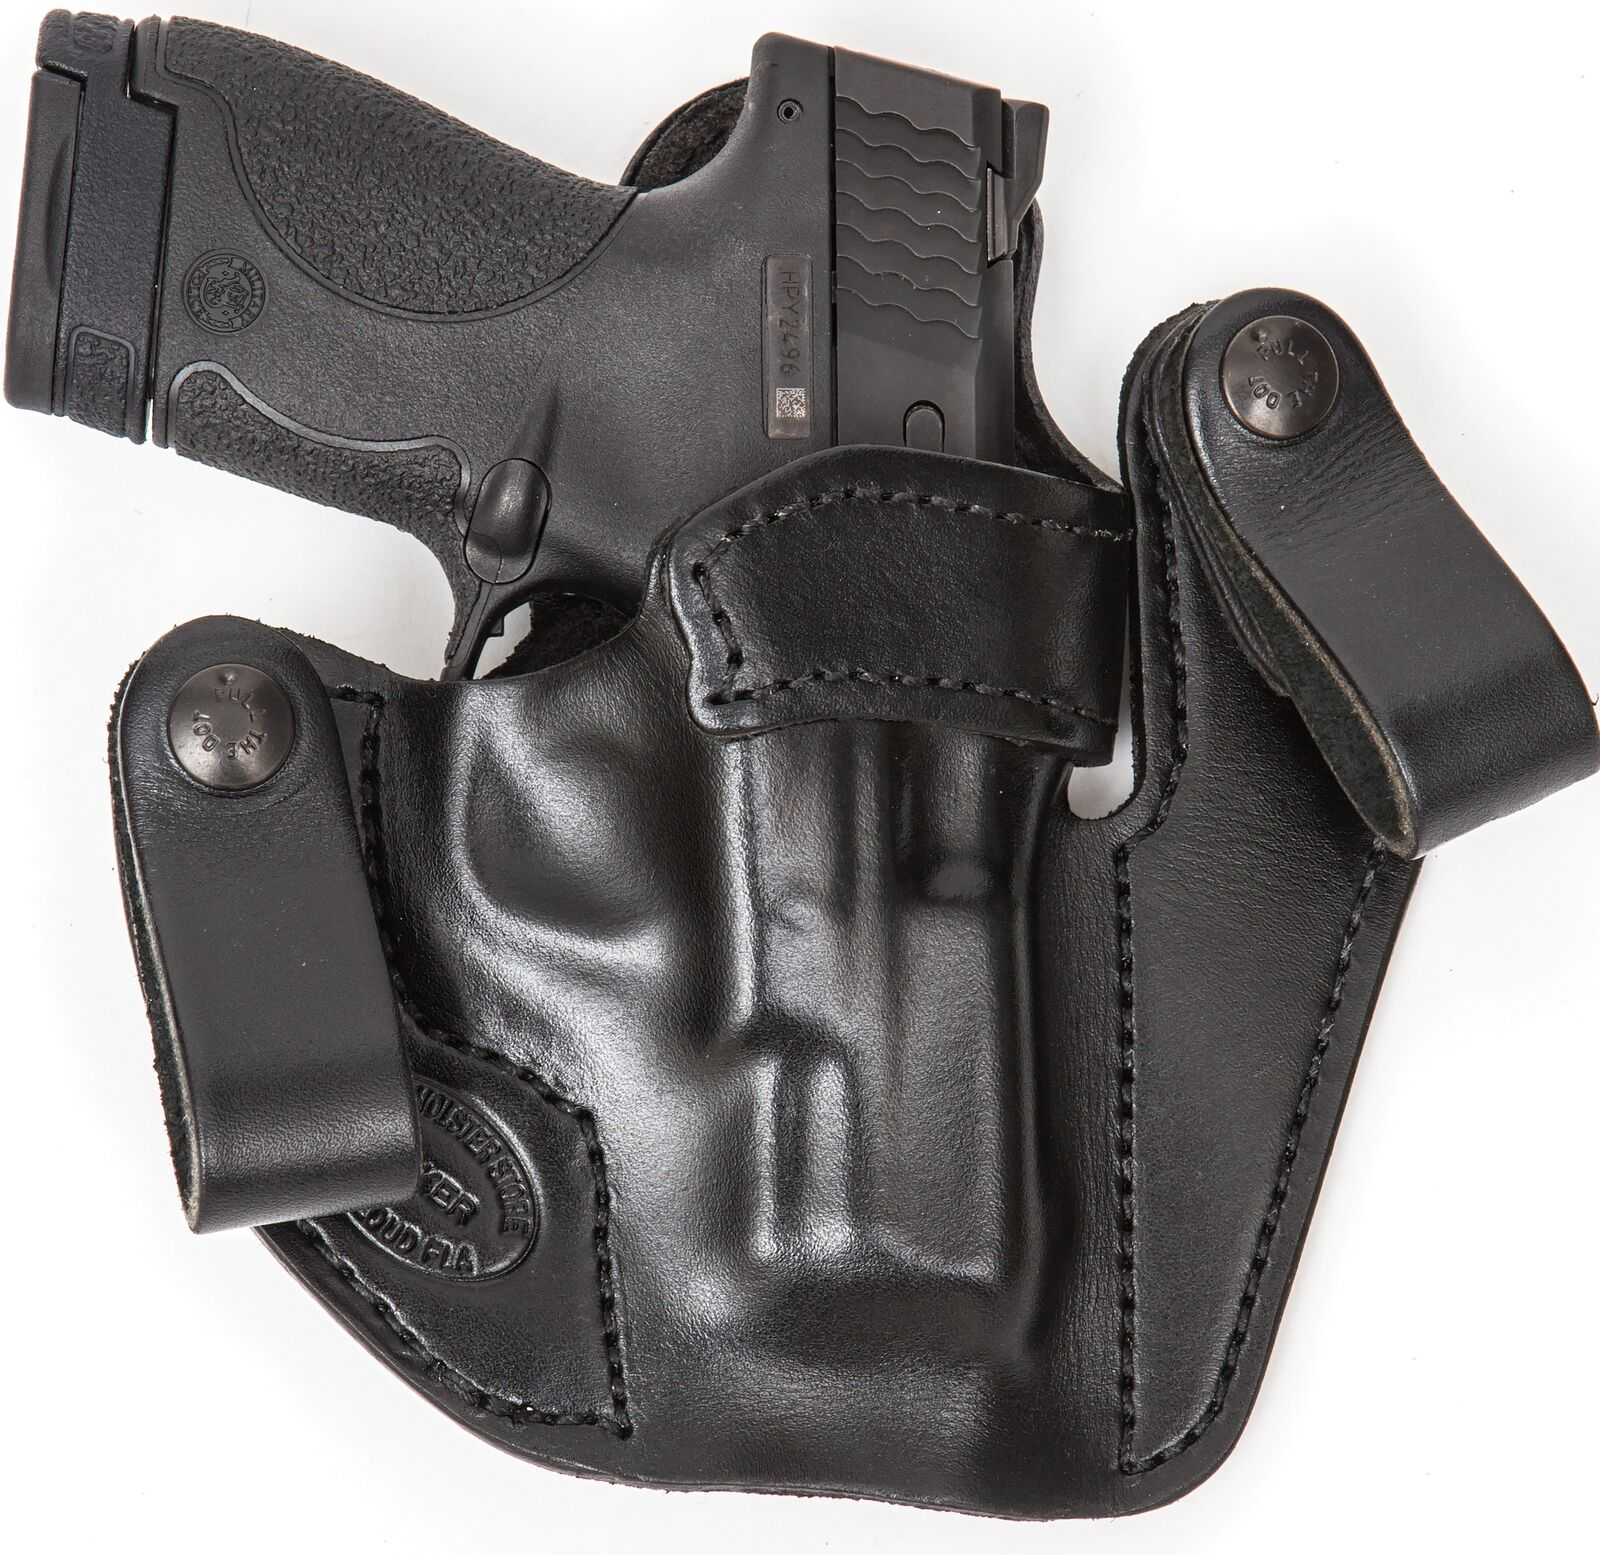 Xtreme llevar RH LH IWB Cuero Funda Pistola Para Glock 19 23 32 36